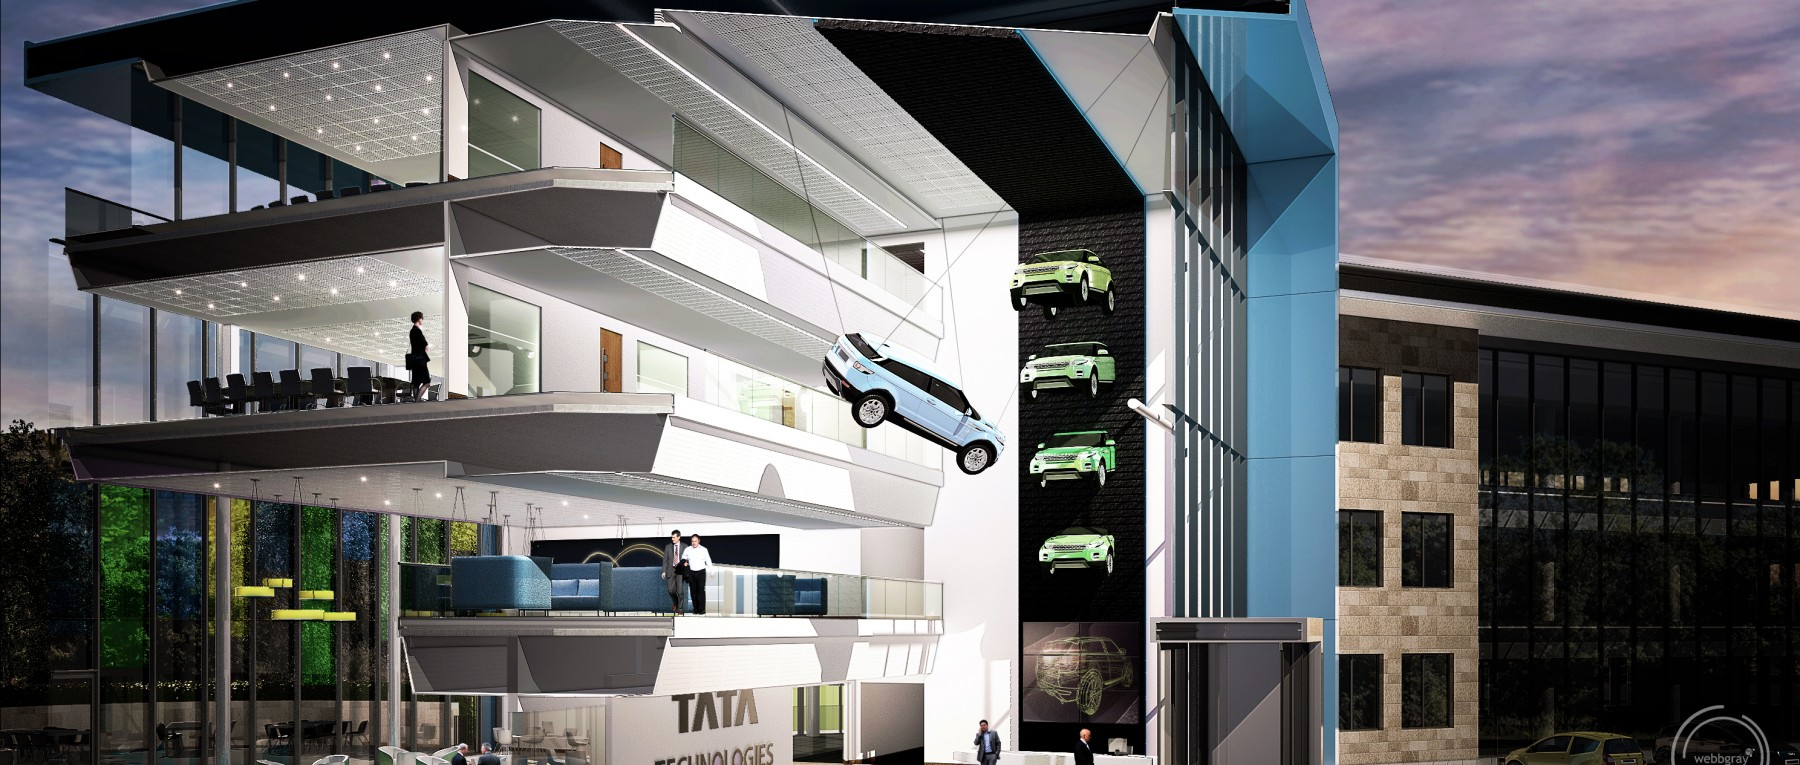 Tata Technologies Limited, Warwickshire - Fusion